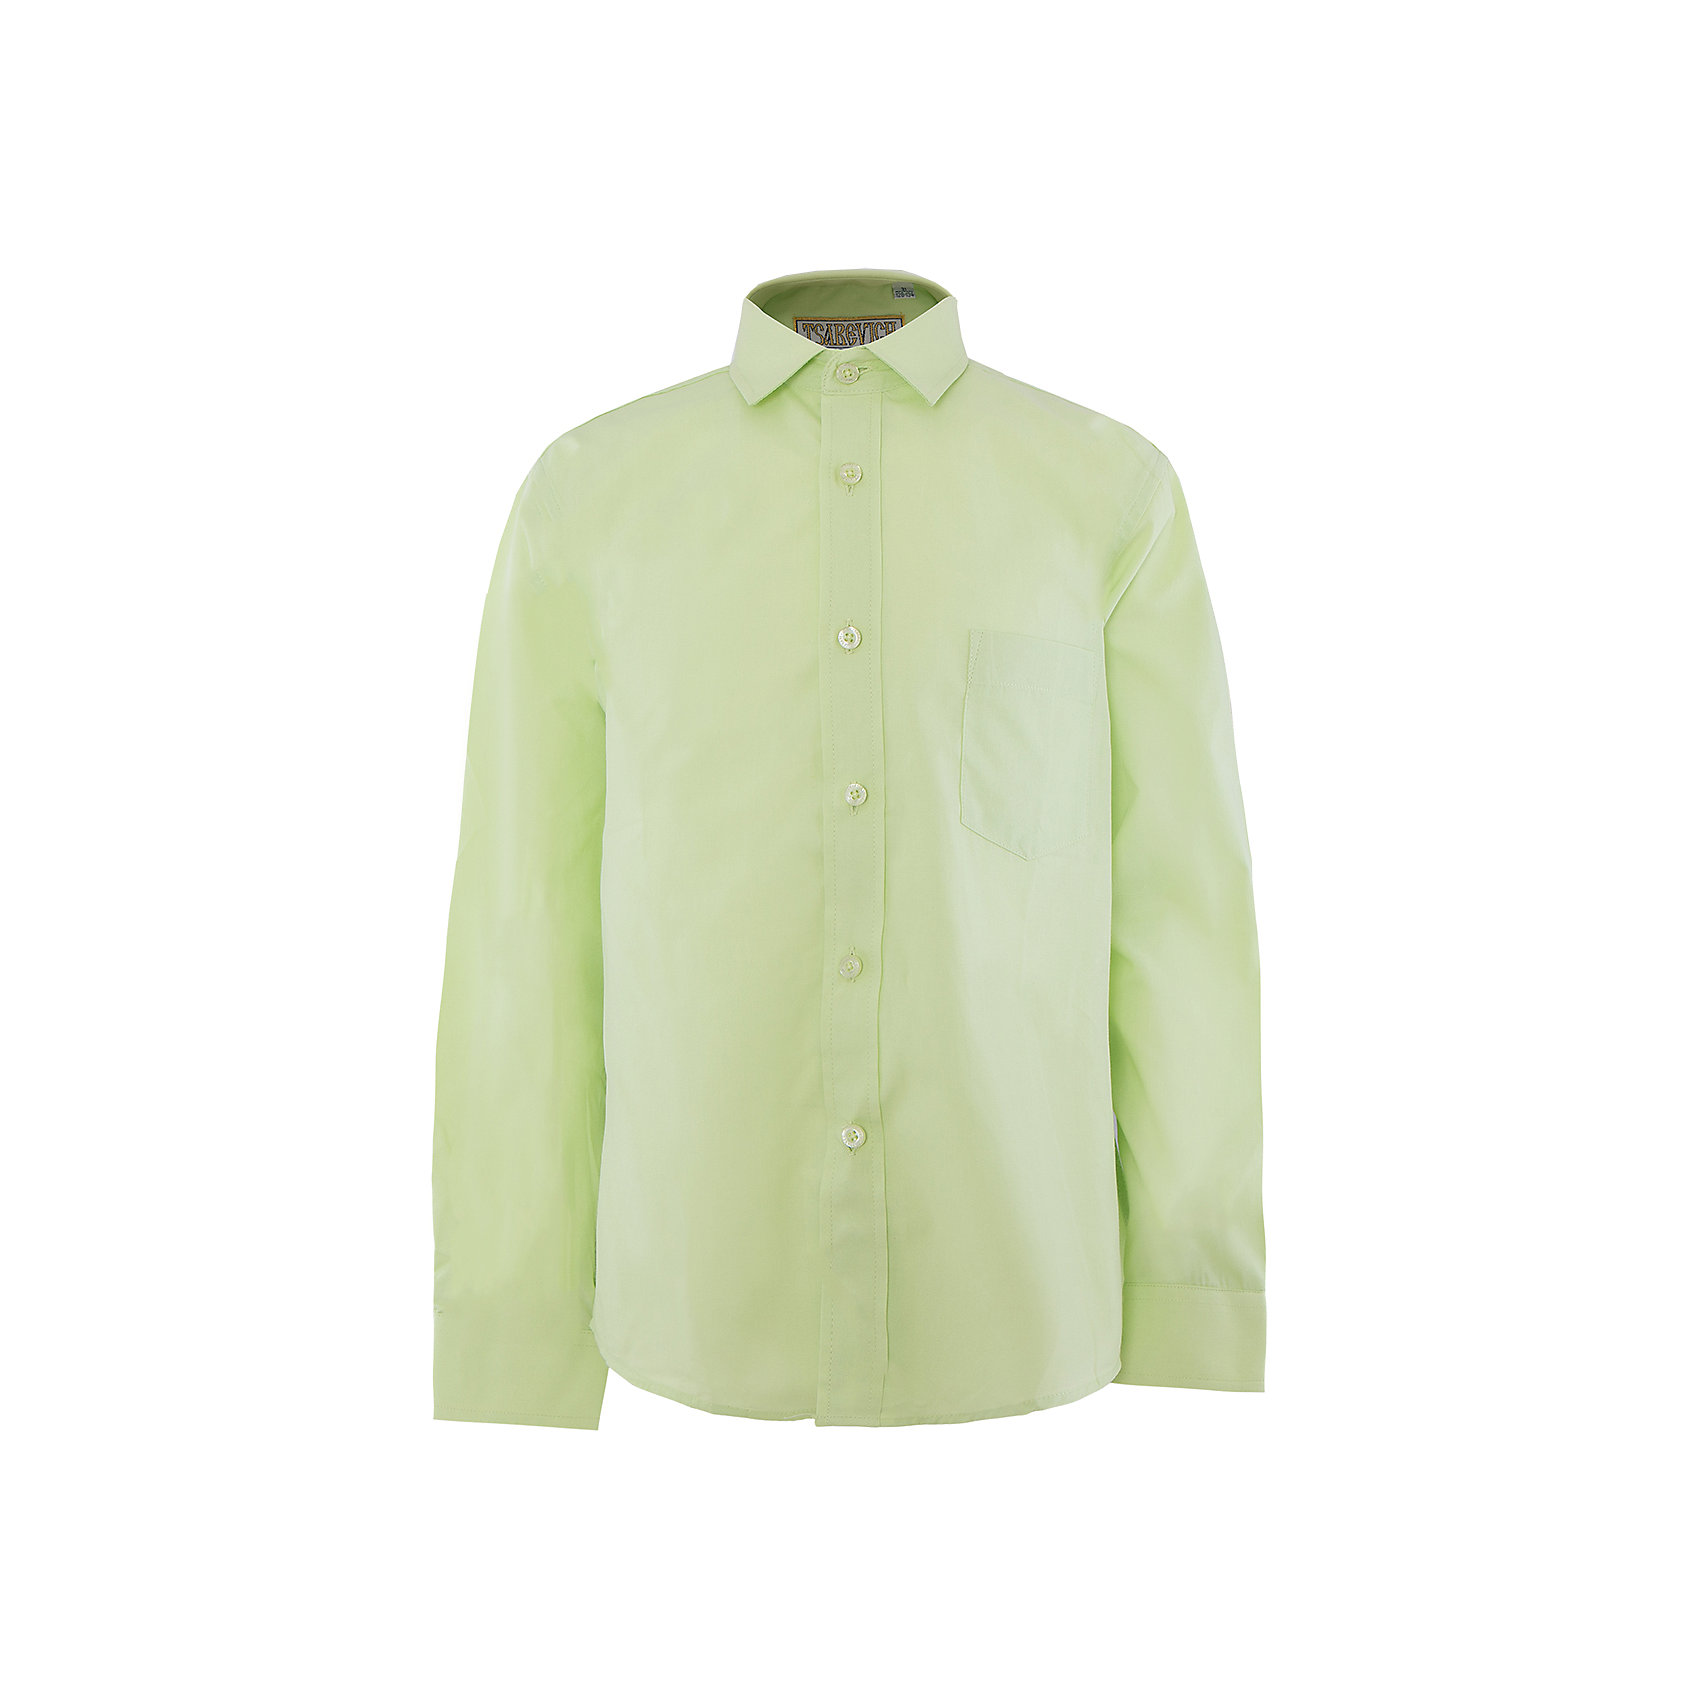 Рубашка для мальчика  TsarevichРубашка для мальчика от российской марки Tsarevich.<br>Состав:<br>80% хлопок  20% полиэстер<br><br>Ширина мм: 174<br>Глубина мм: 10<br>Высота мм: 169<br>Вес г: 157<br>Цвет: зеленый<br>Возраст от месяцев: 144<br>Возраст до месяцев: 156<br>Пол: Мужской<br>Возраст: Детский<br>Размер: 164/170,134/140,122/128,128/134,140/146,146/152,152/158,158/164<br>SKU: 4163663